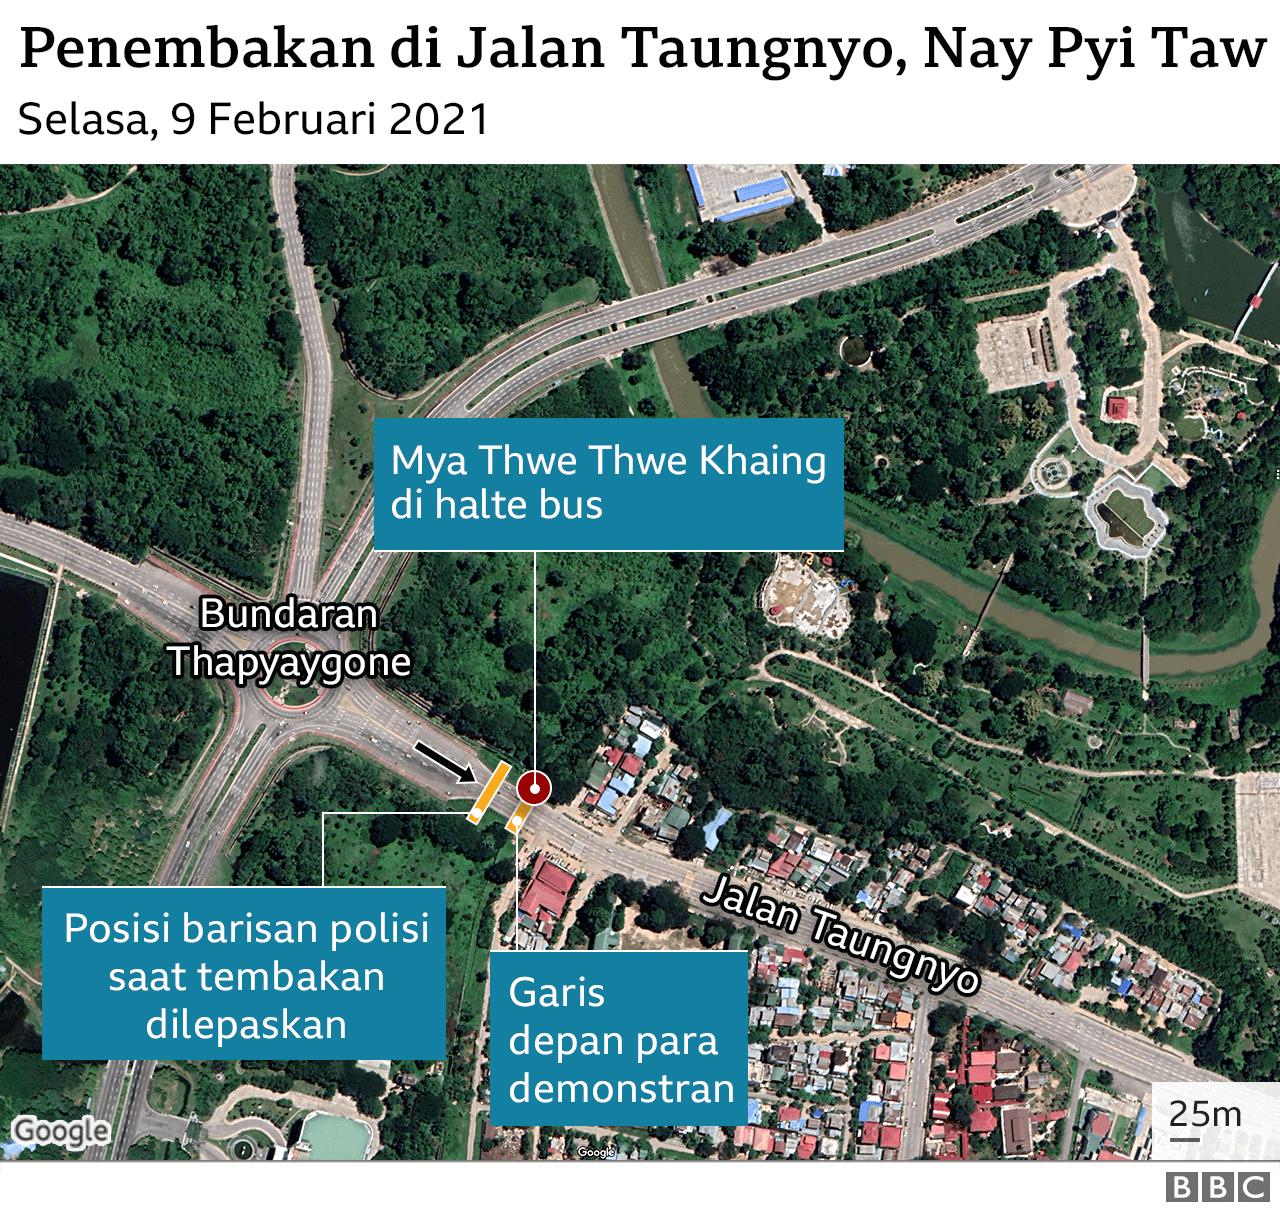 Peta tempat penembakan